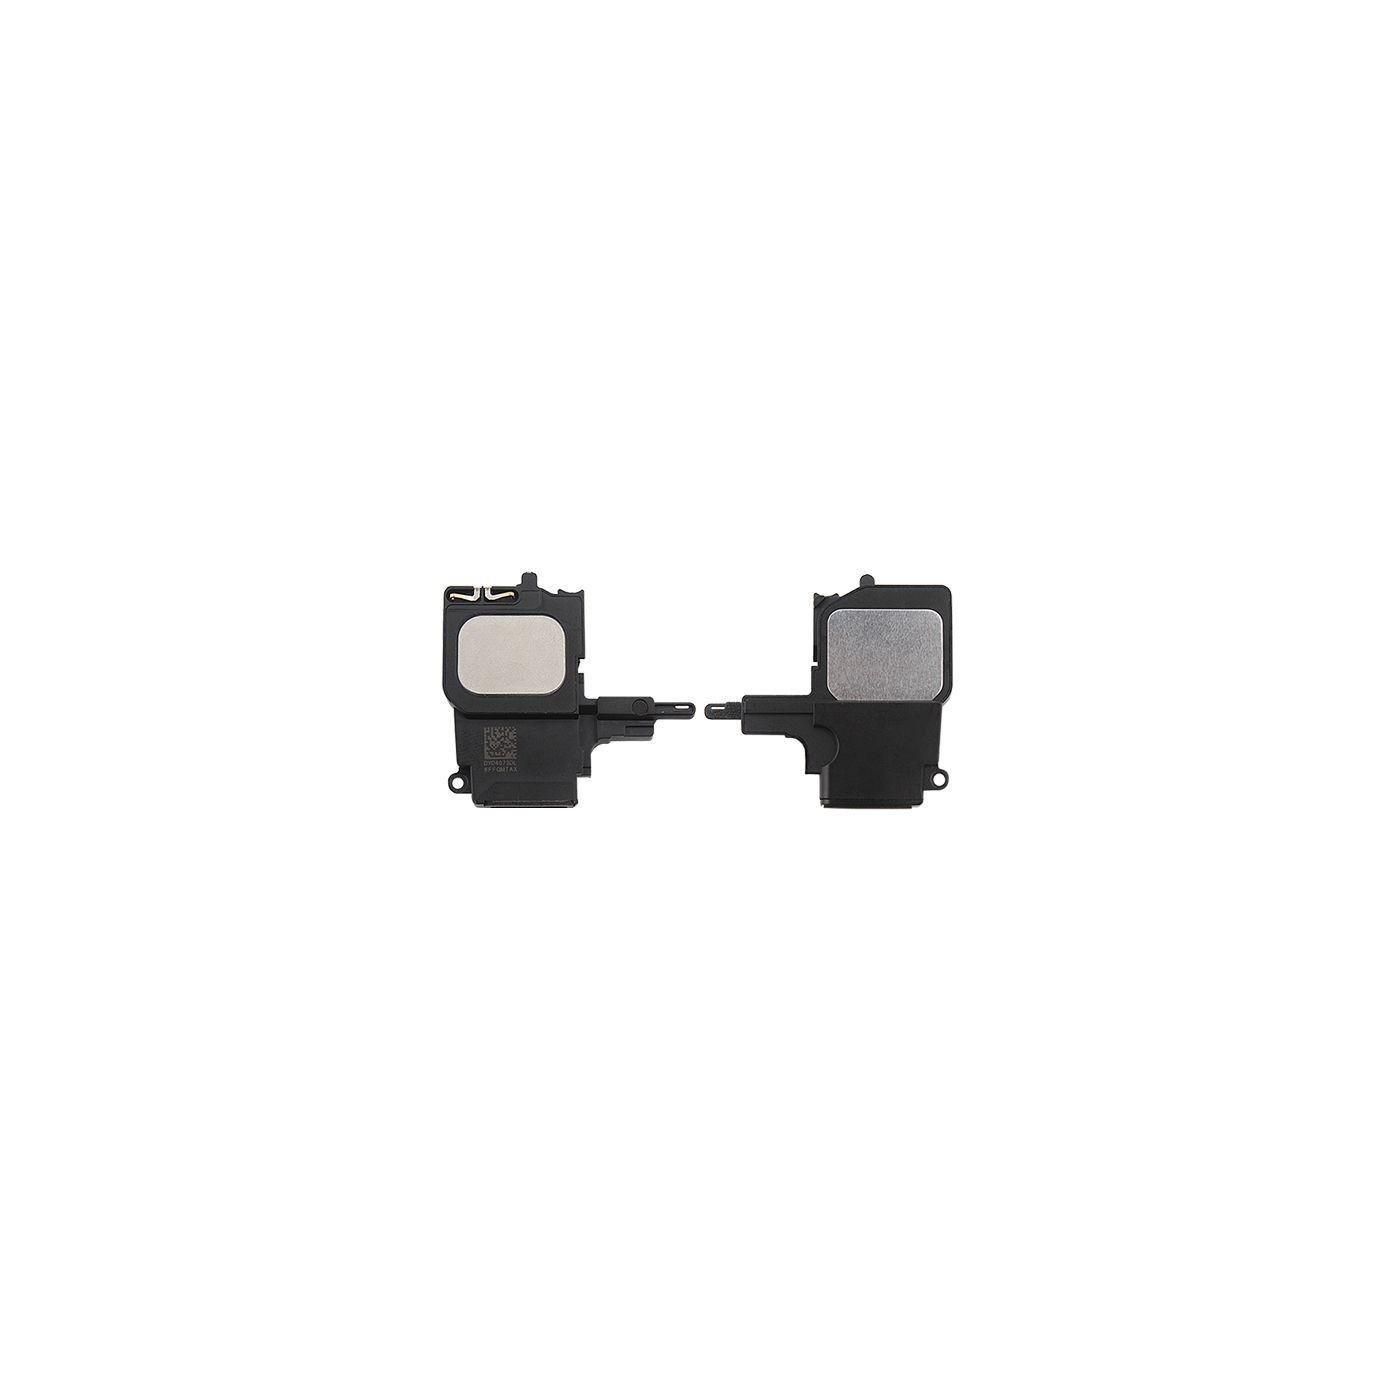 Loud speaker iphone 5s buzzer ricambio casse altoparlante inferiore